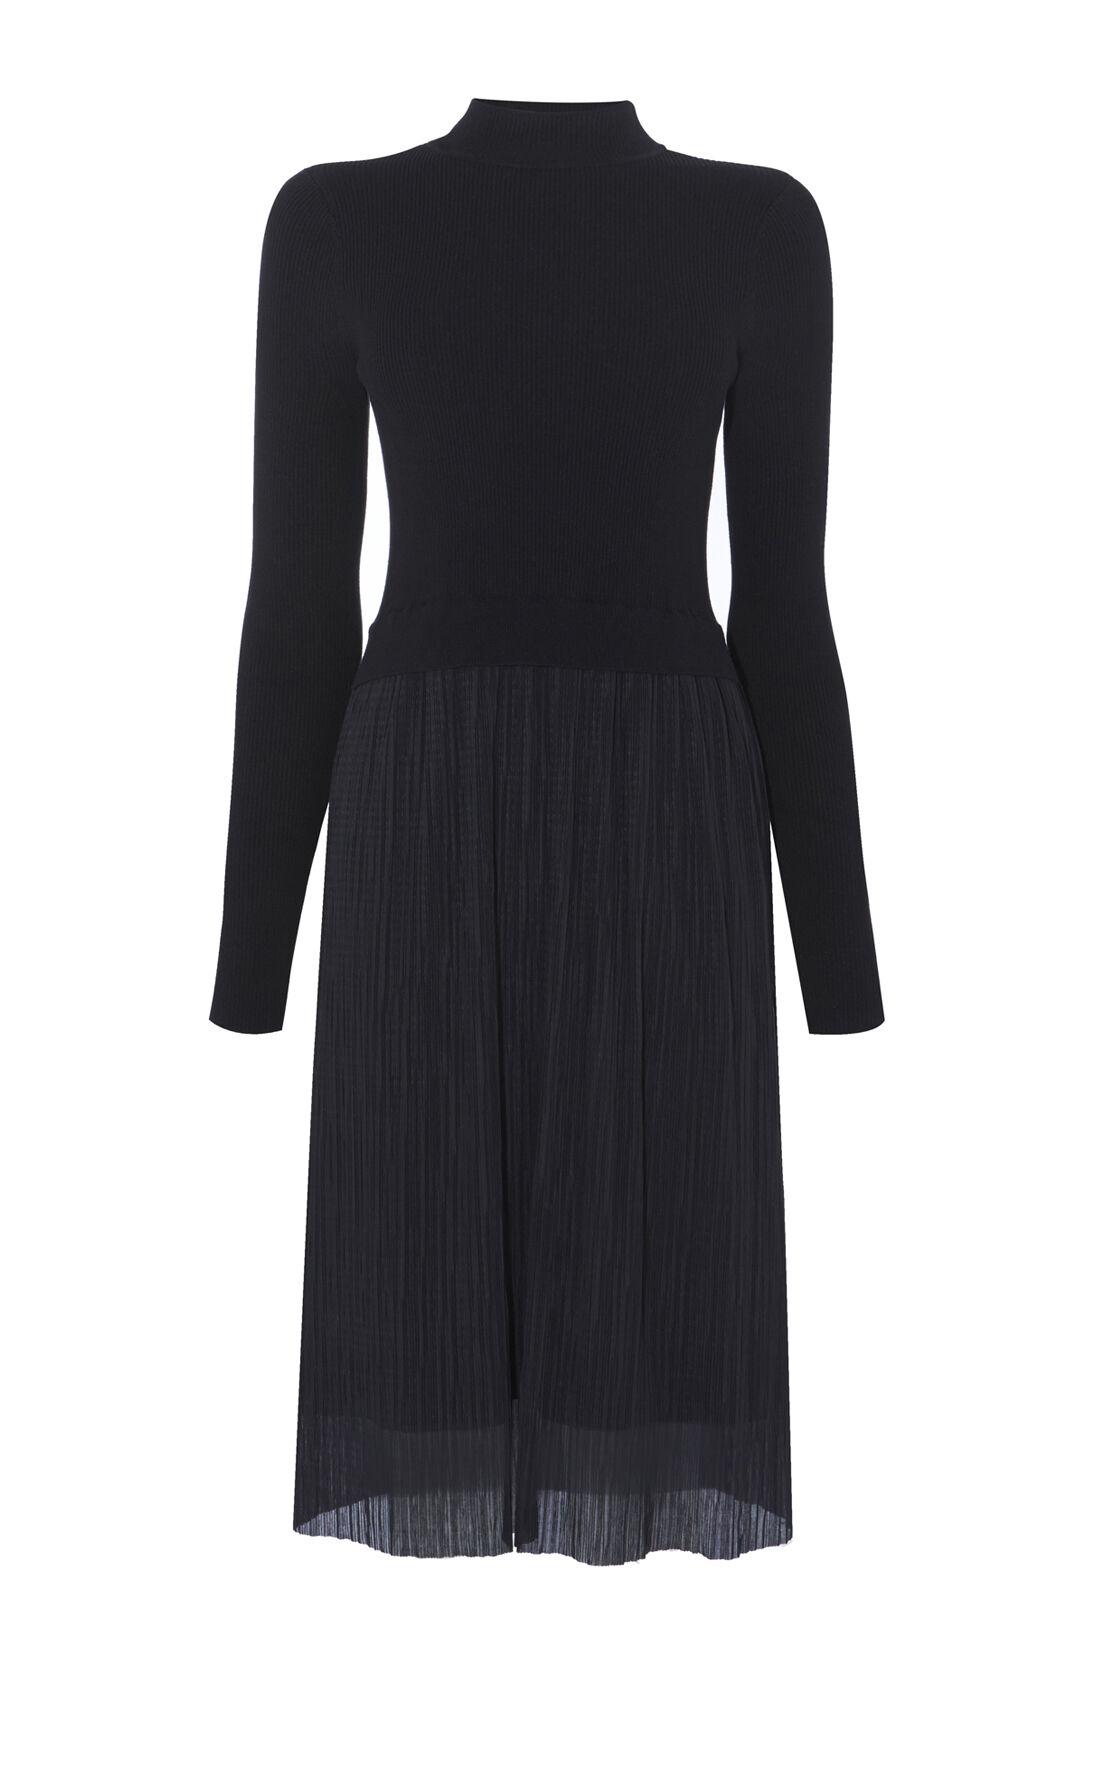 Karen Millen, PLEAT-SKIRT DRESS Black 0